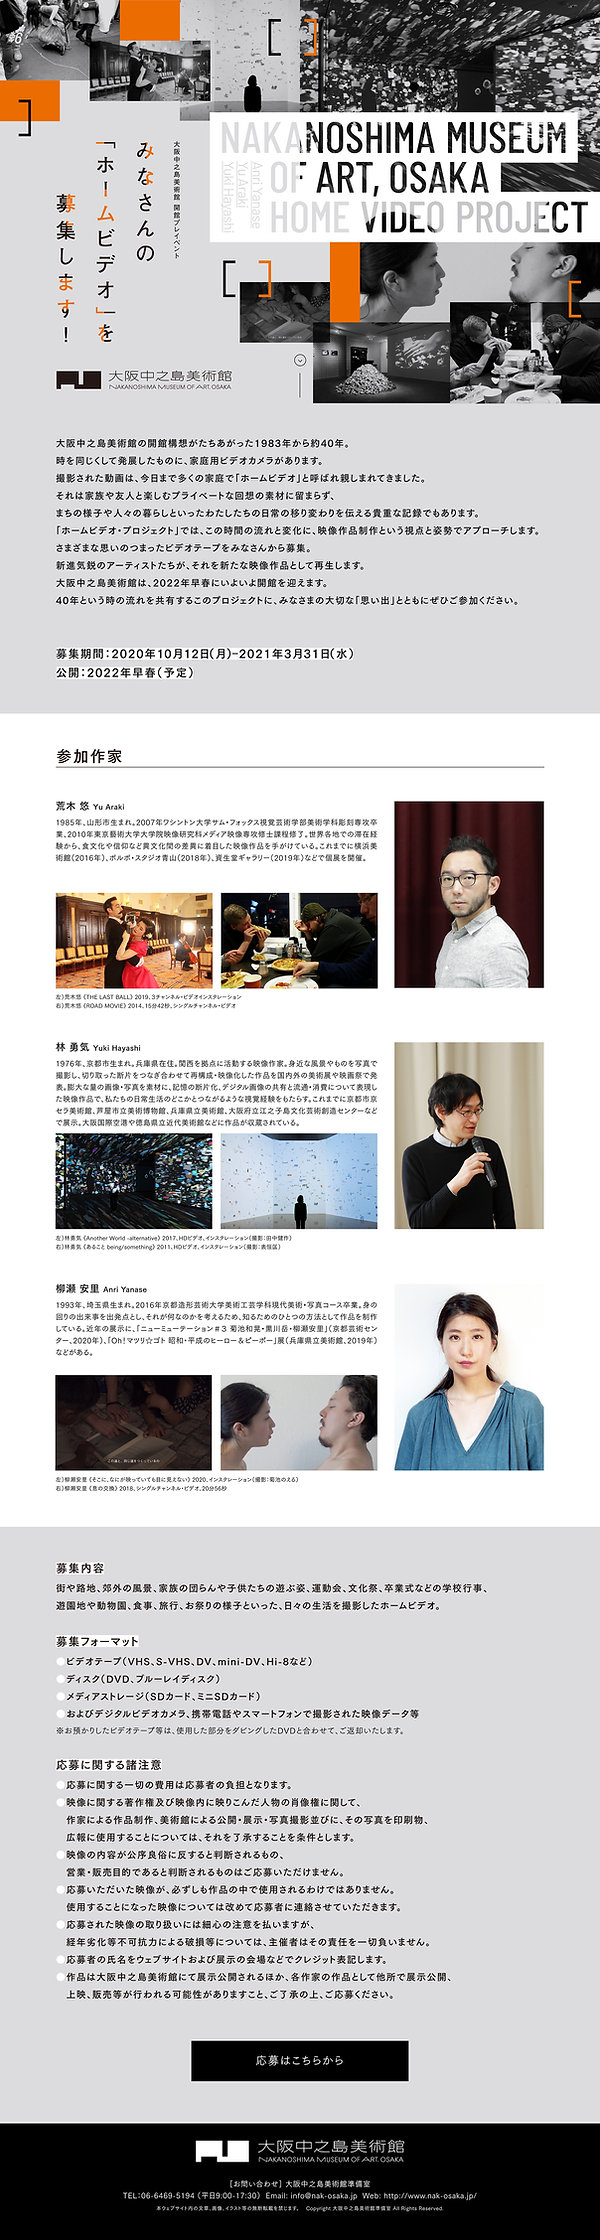 eizo_02.jpg